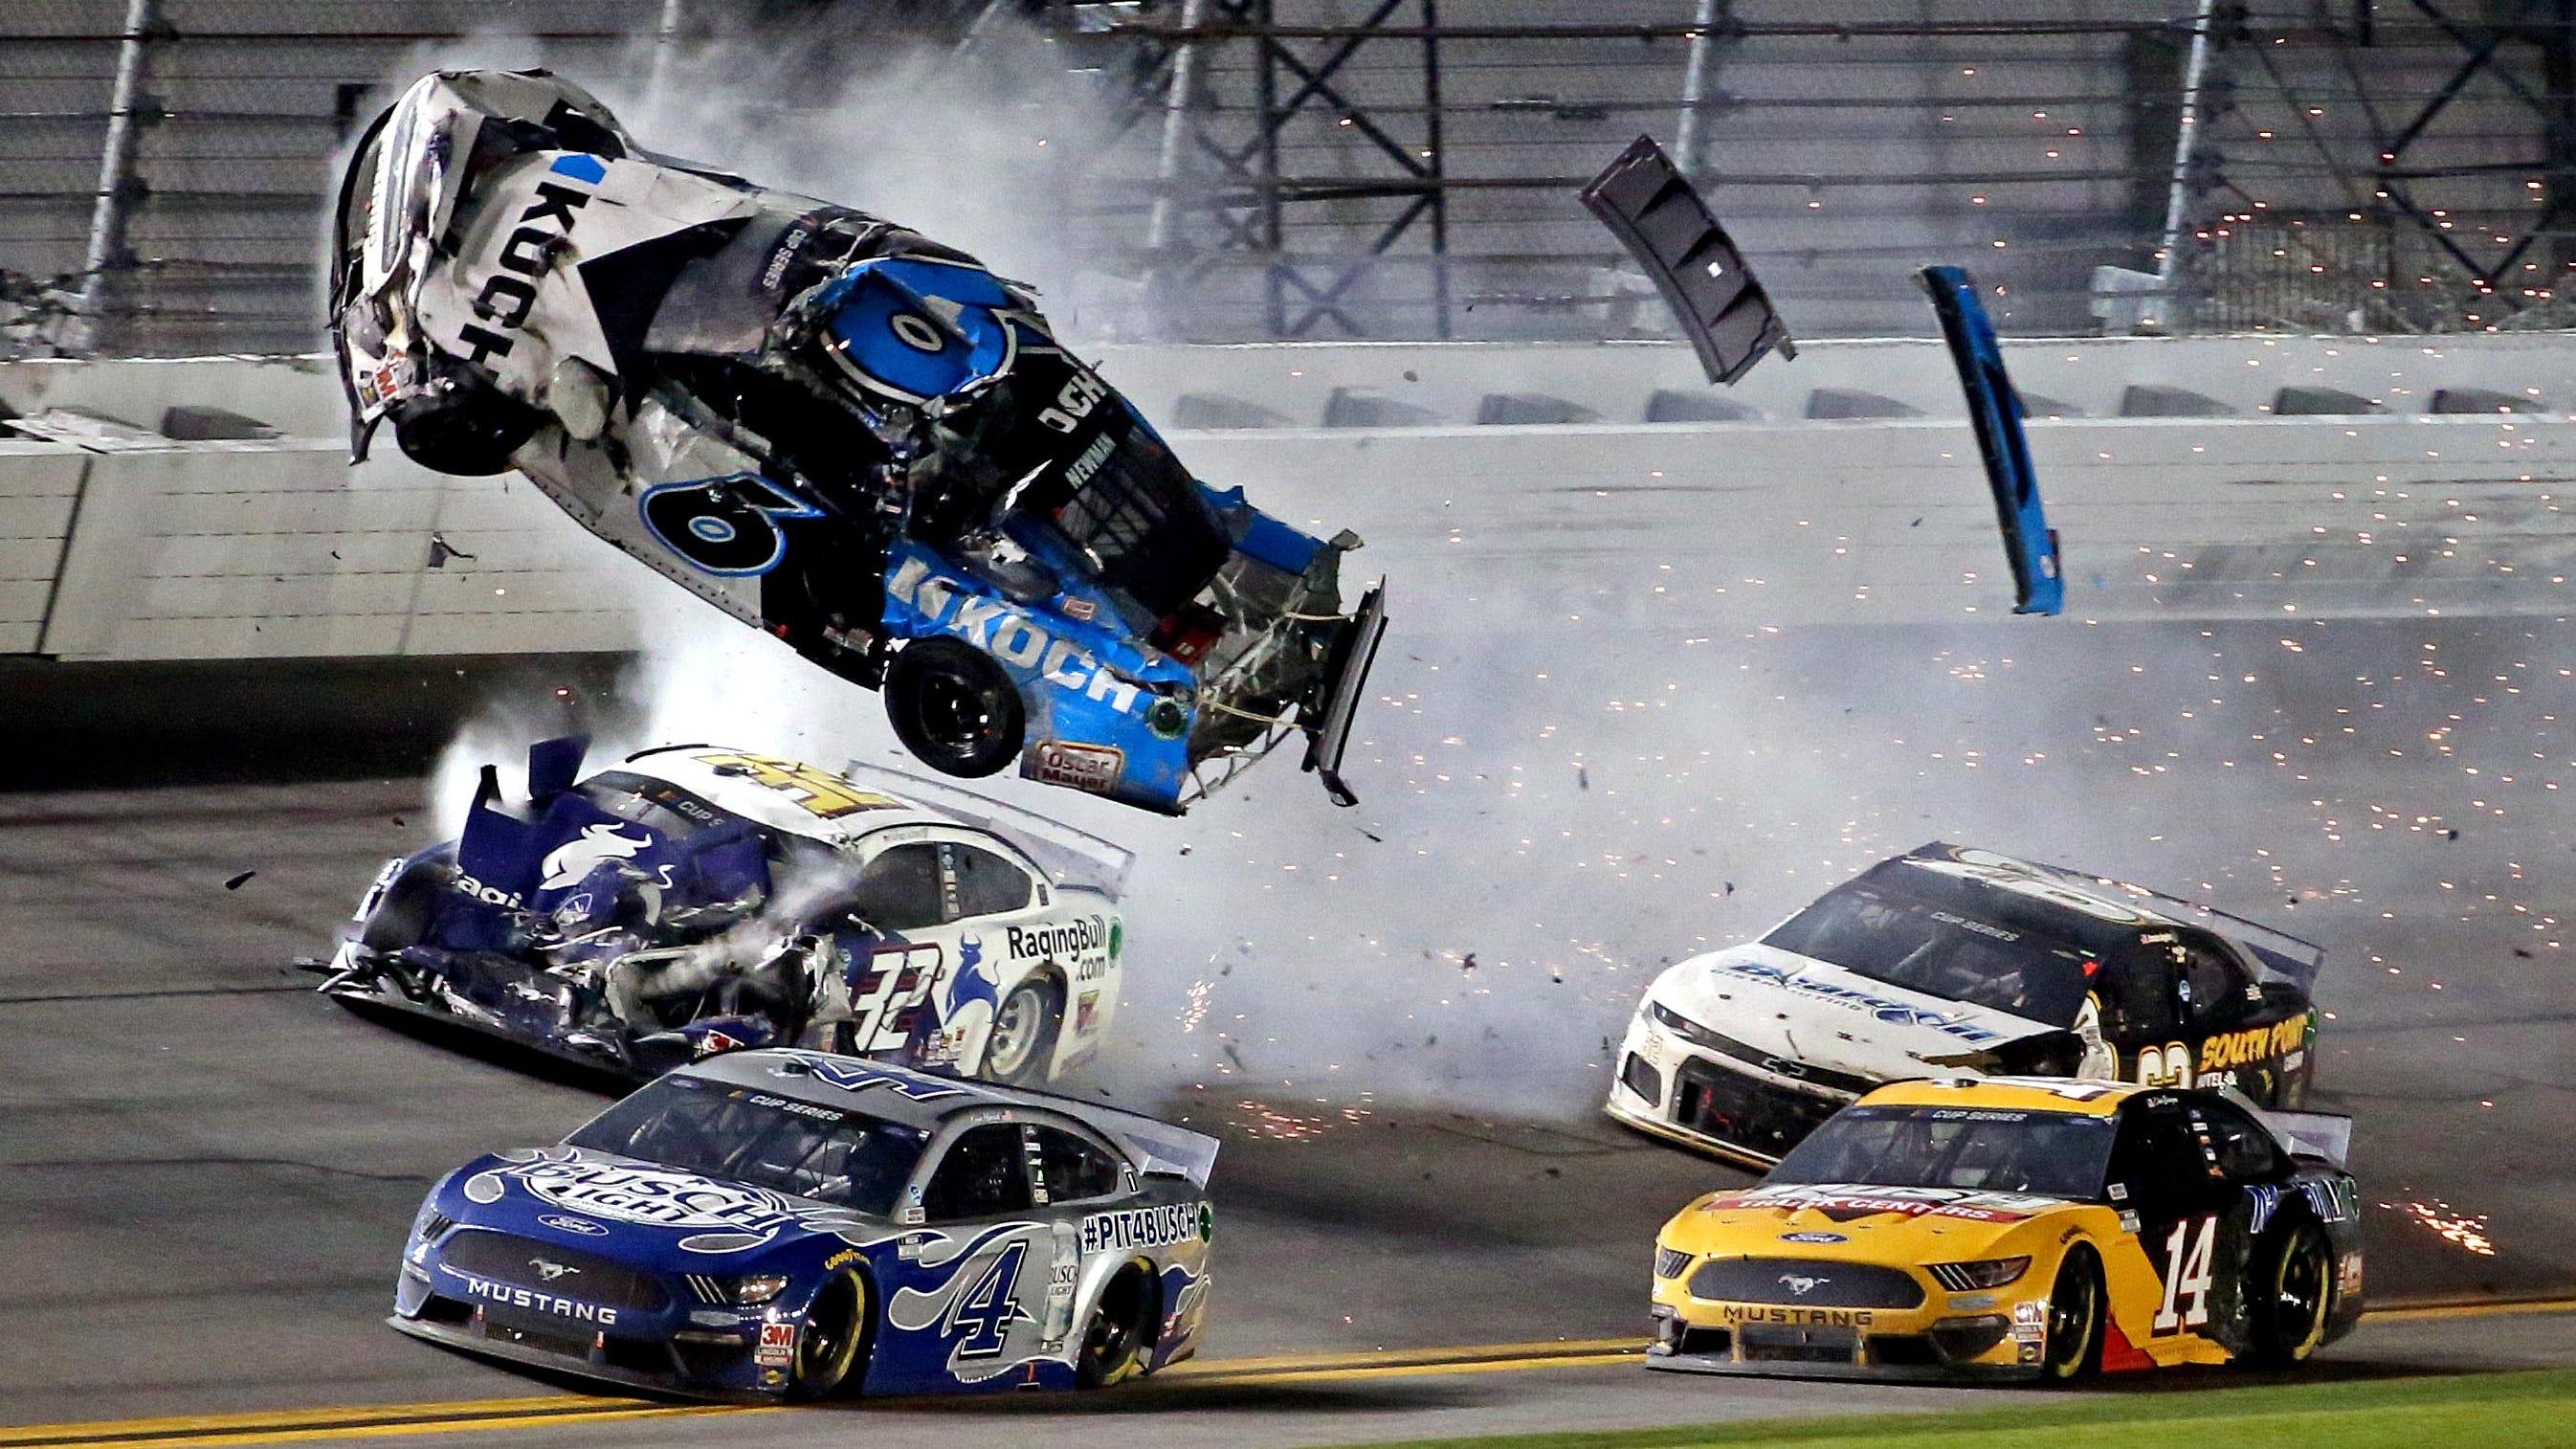 Ryan Newman S Daytona 500 Crash Has Nascar Indycar Drivers Concerned